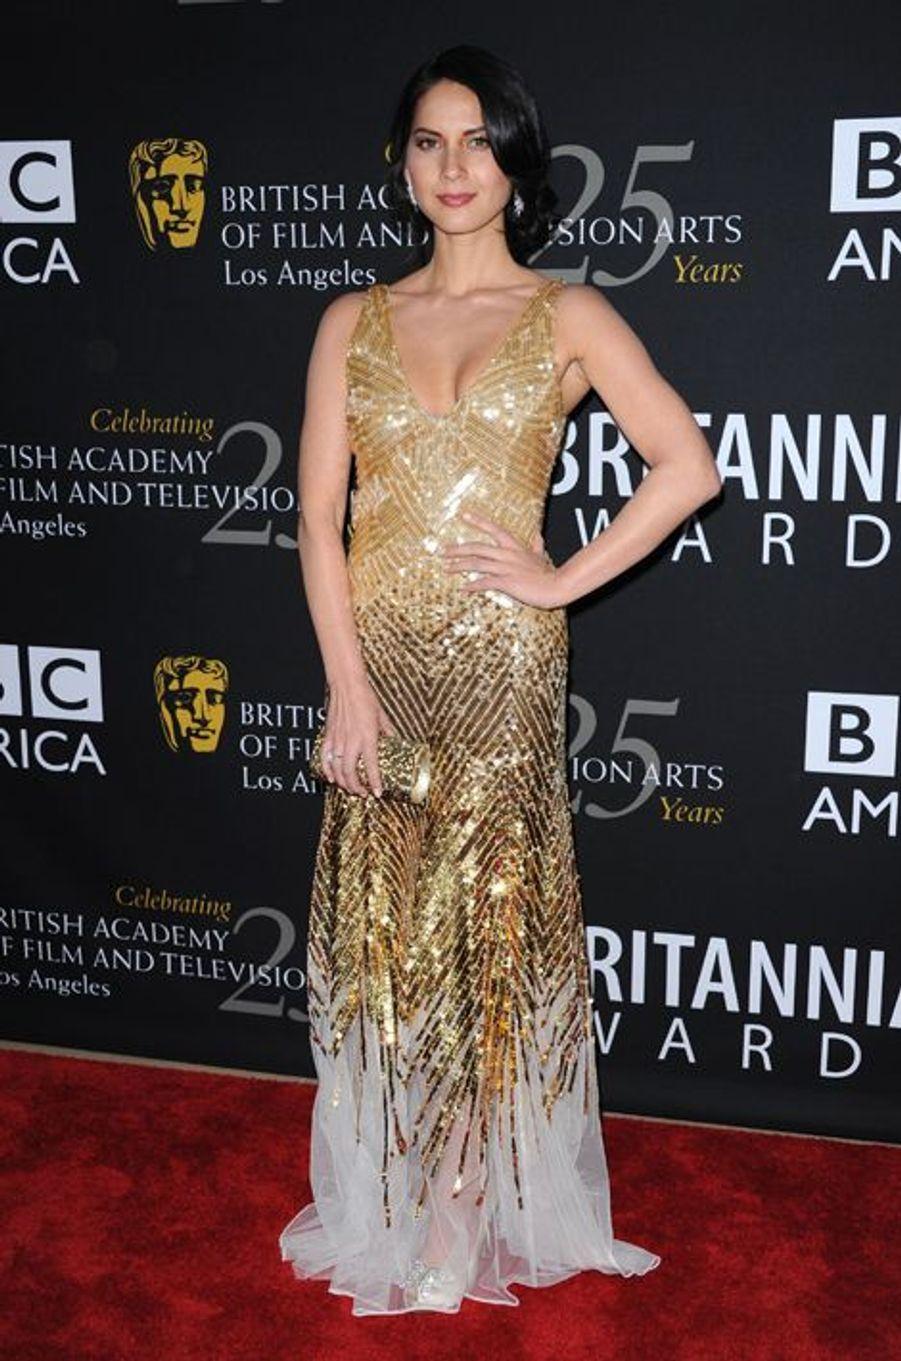 Olivia Munn en Temperley London aux BAFTA LA 2012 Britannia Awards, en novembre 2012